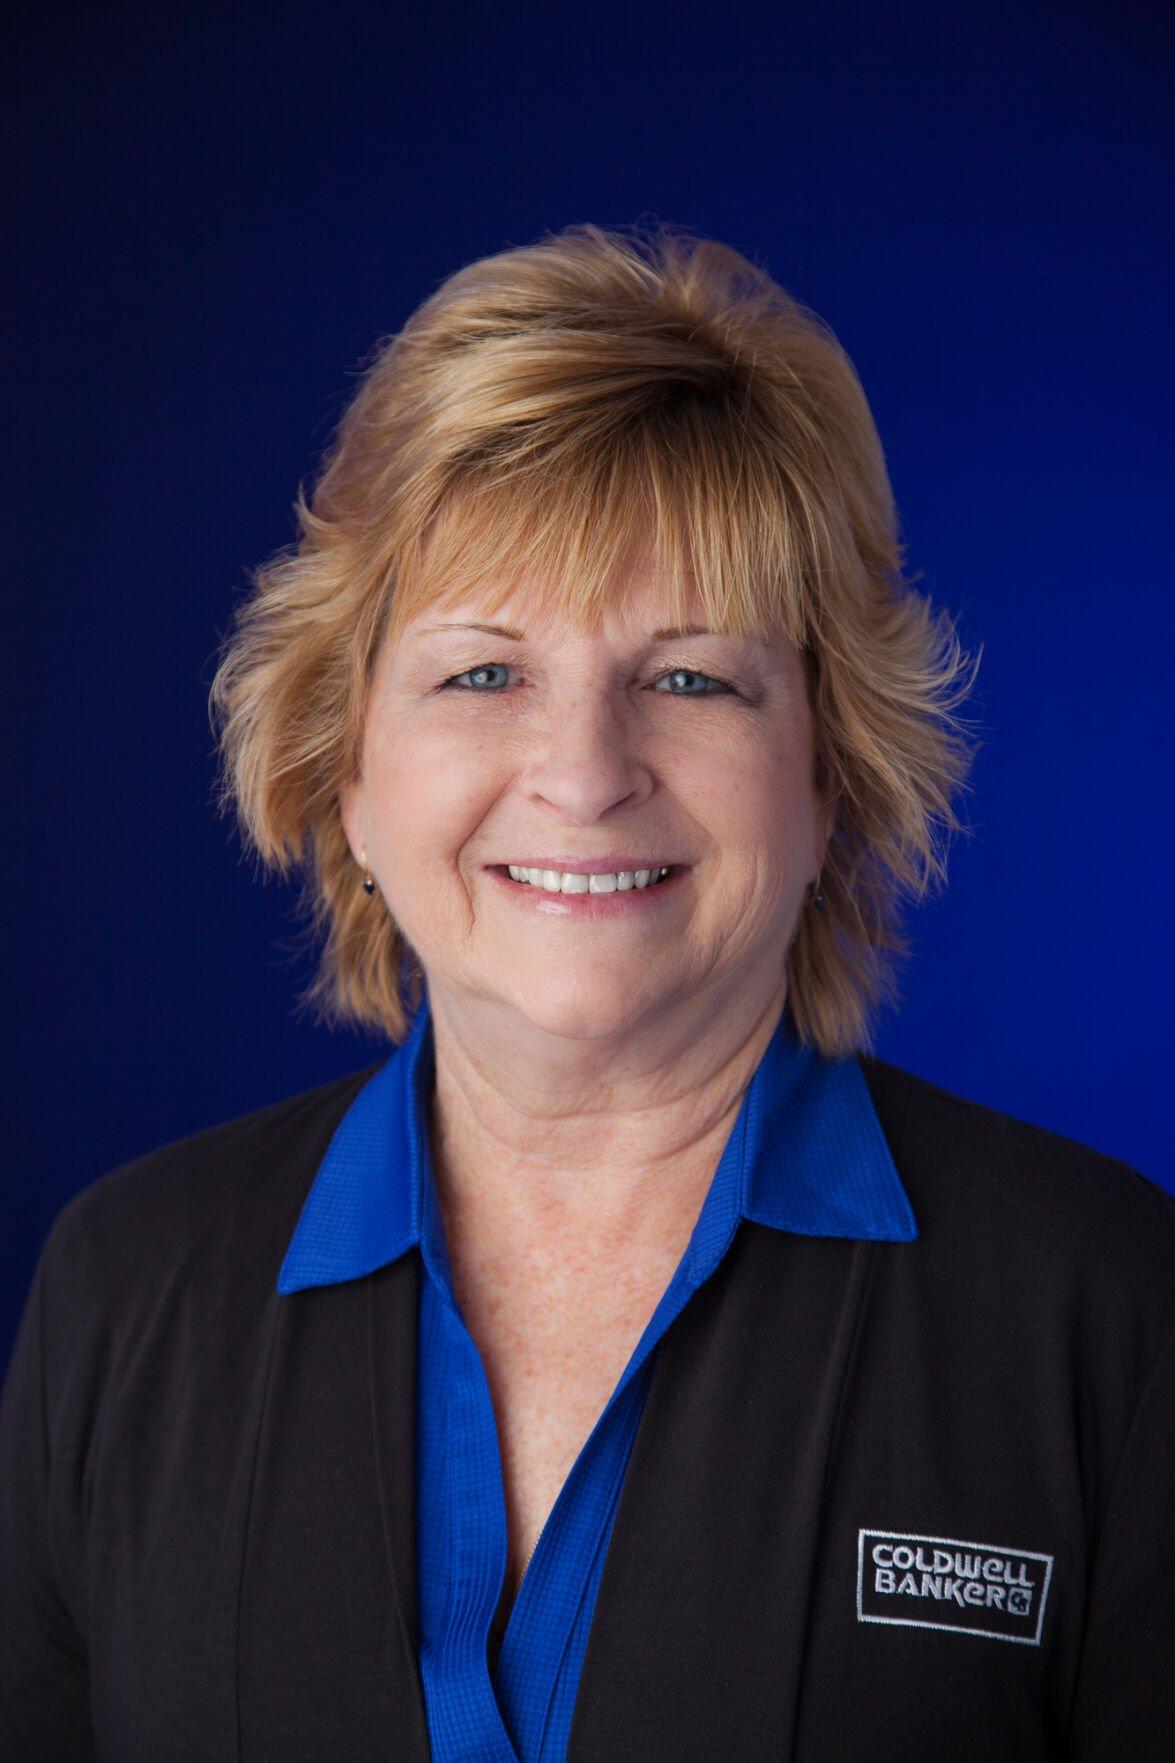 Coldwell Banker Carol Ford